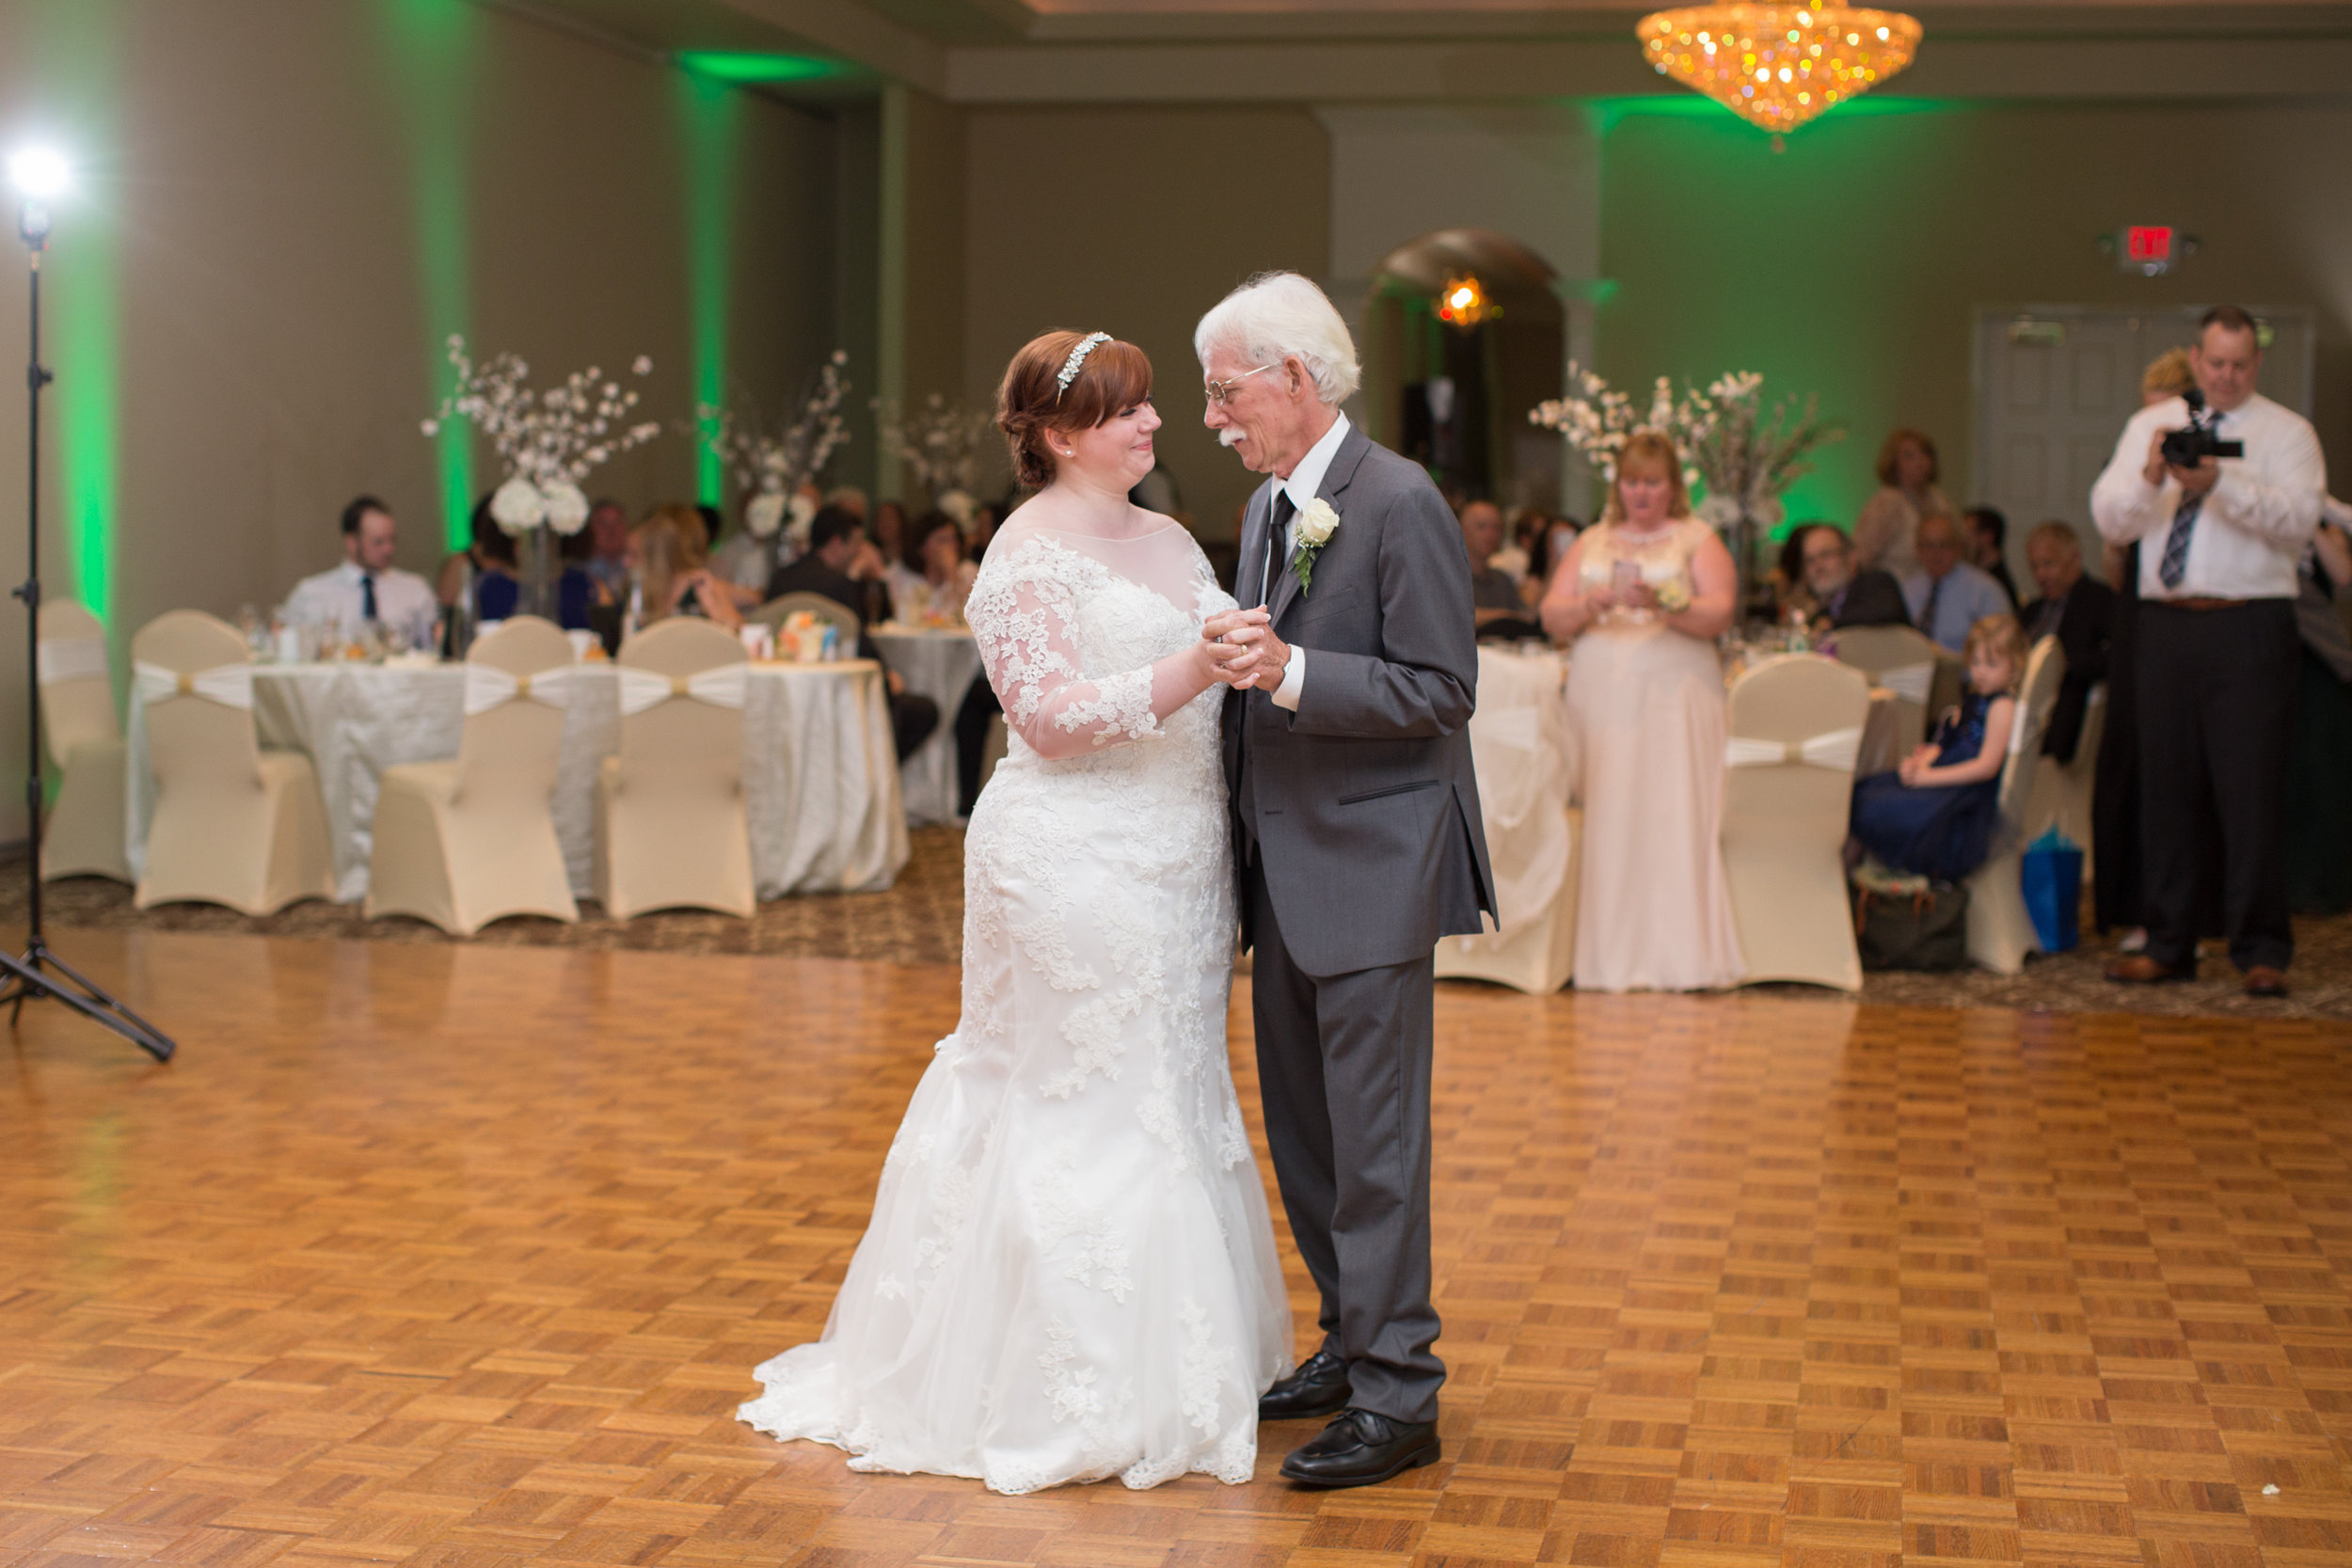 Fiorellis Wedding Photos_JDP-146.jpg